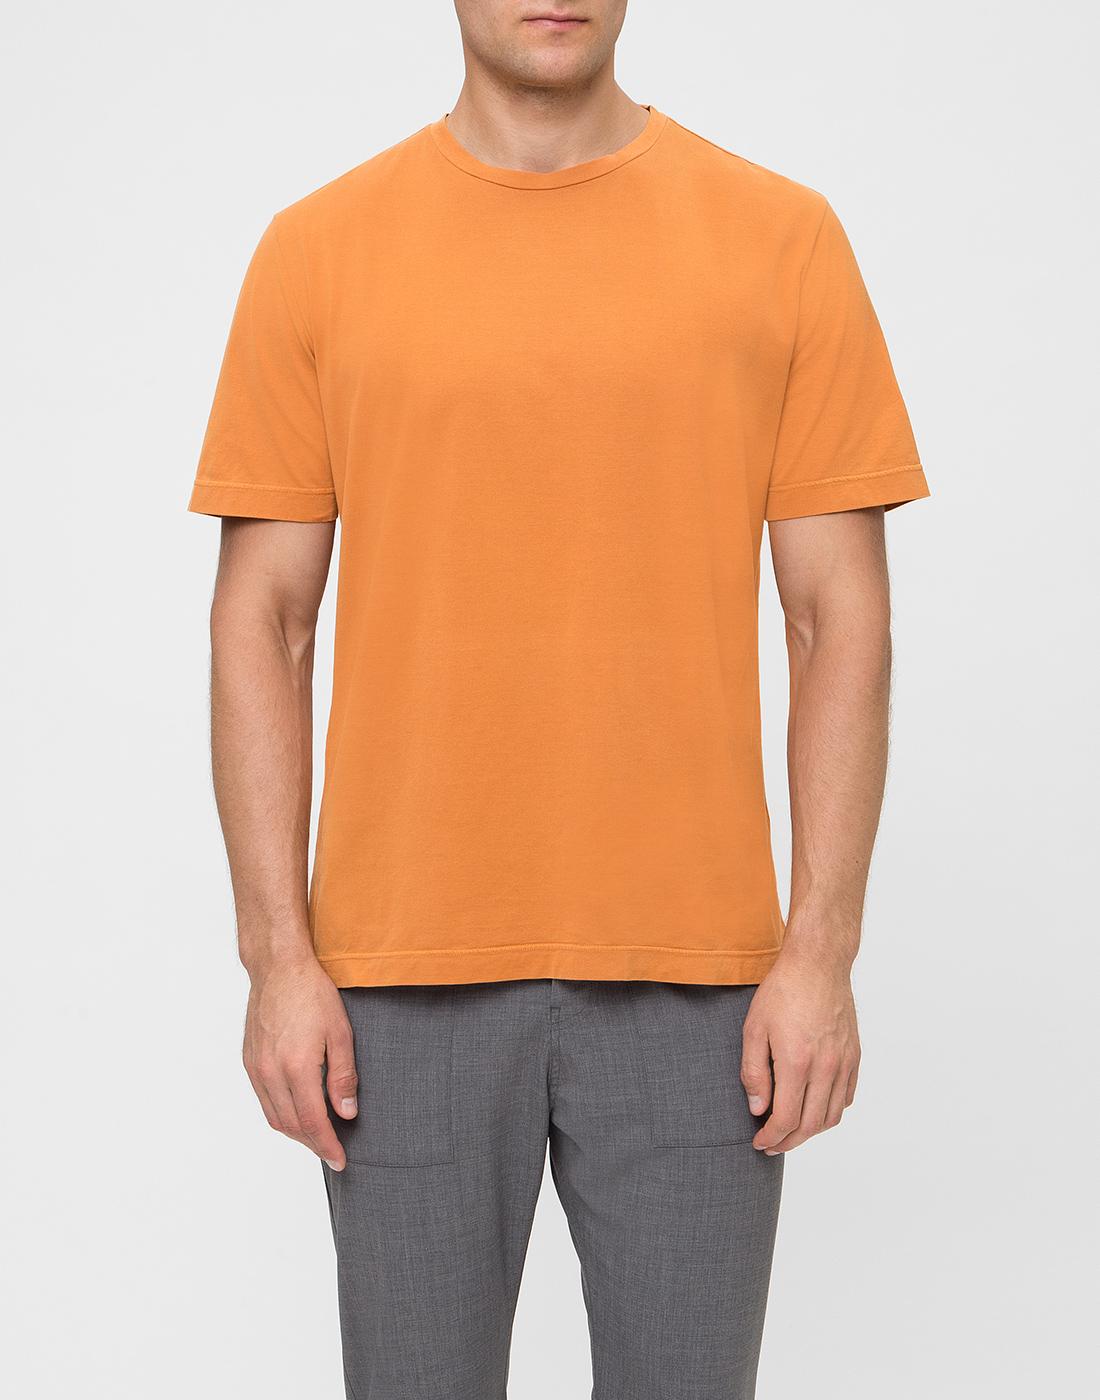 Мужская оранжевая футболка Capobianco S4M660.AL01 ARANCIONE-2